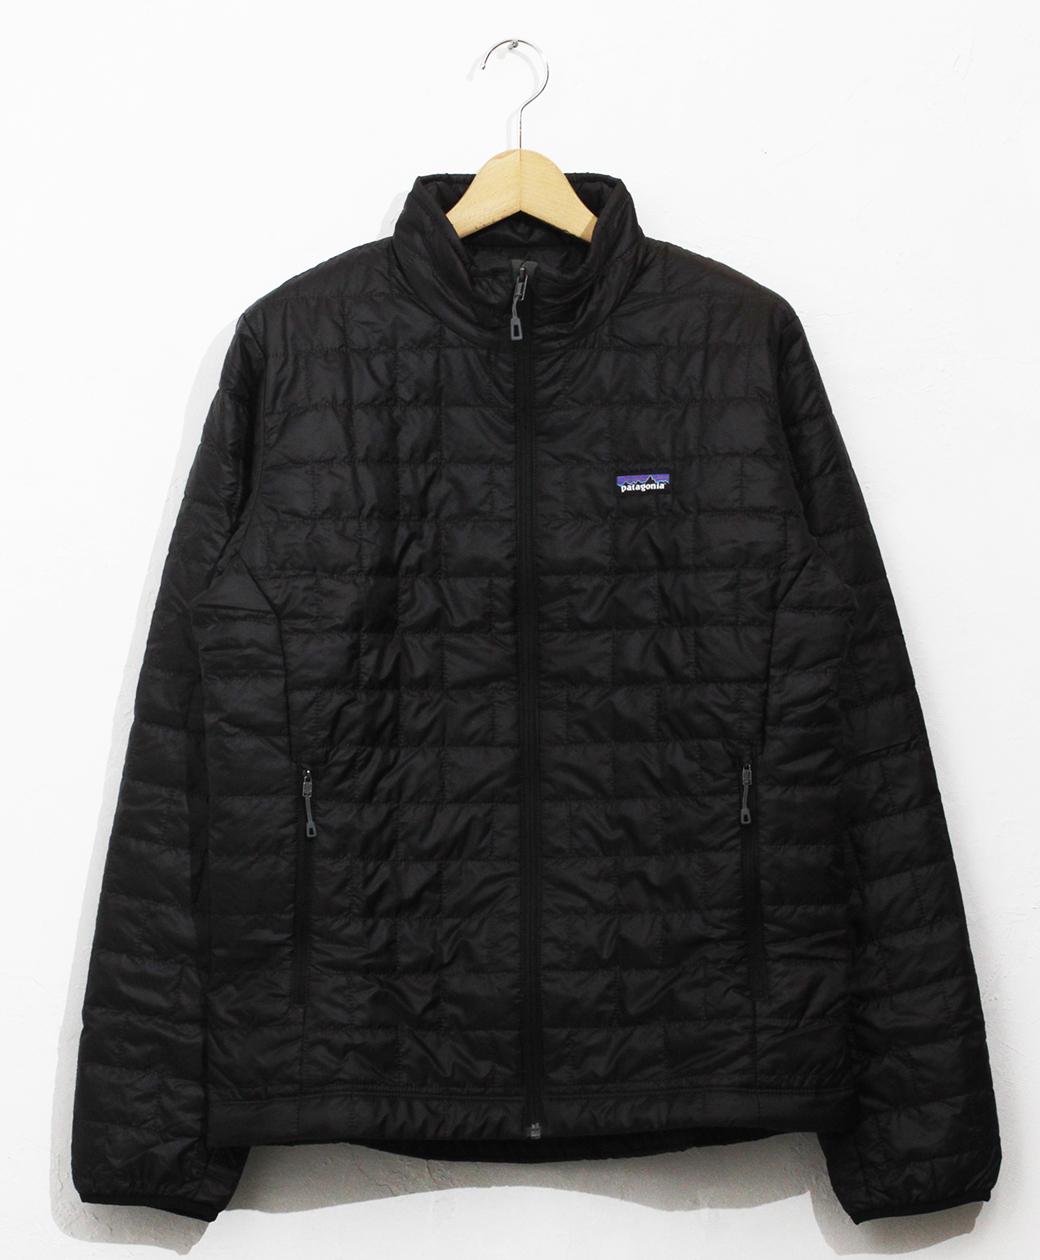 patagonia M's Nano Puff Jacket(BLK)